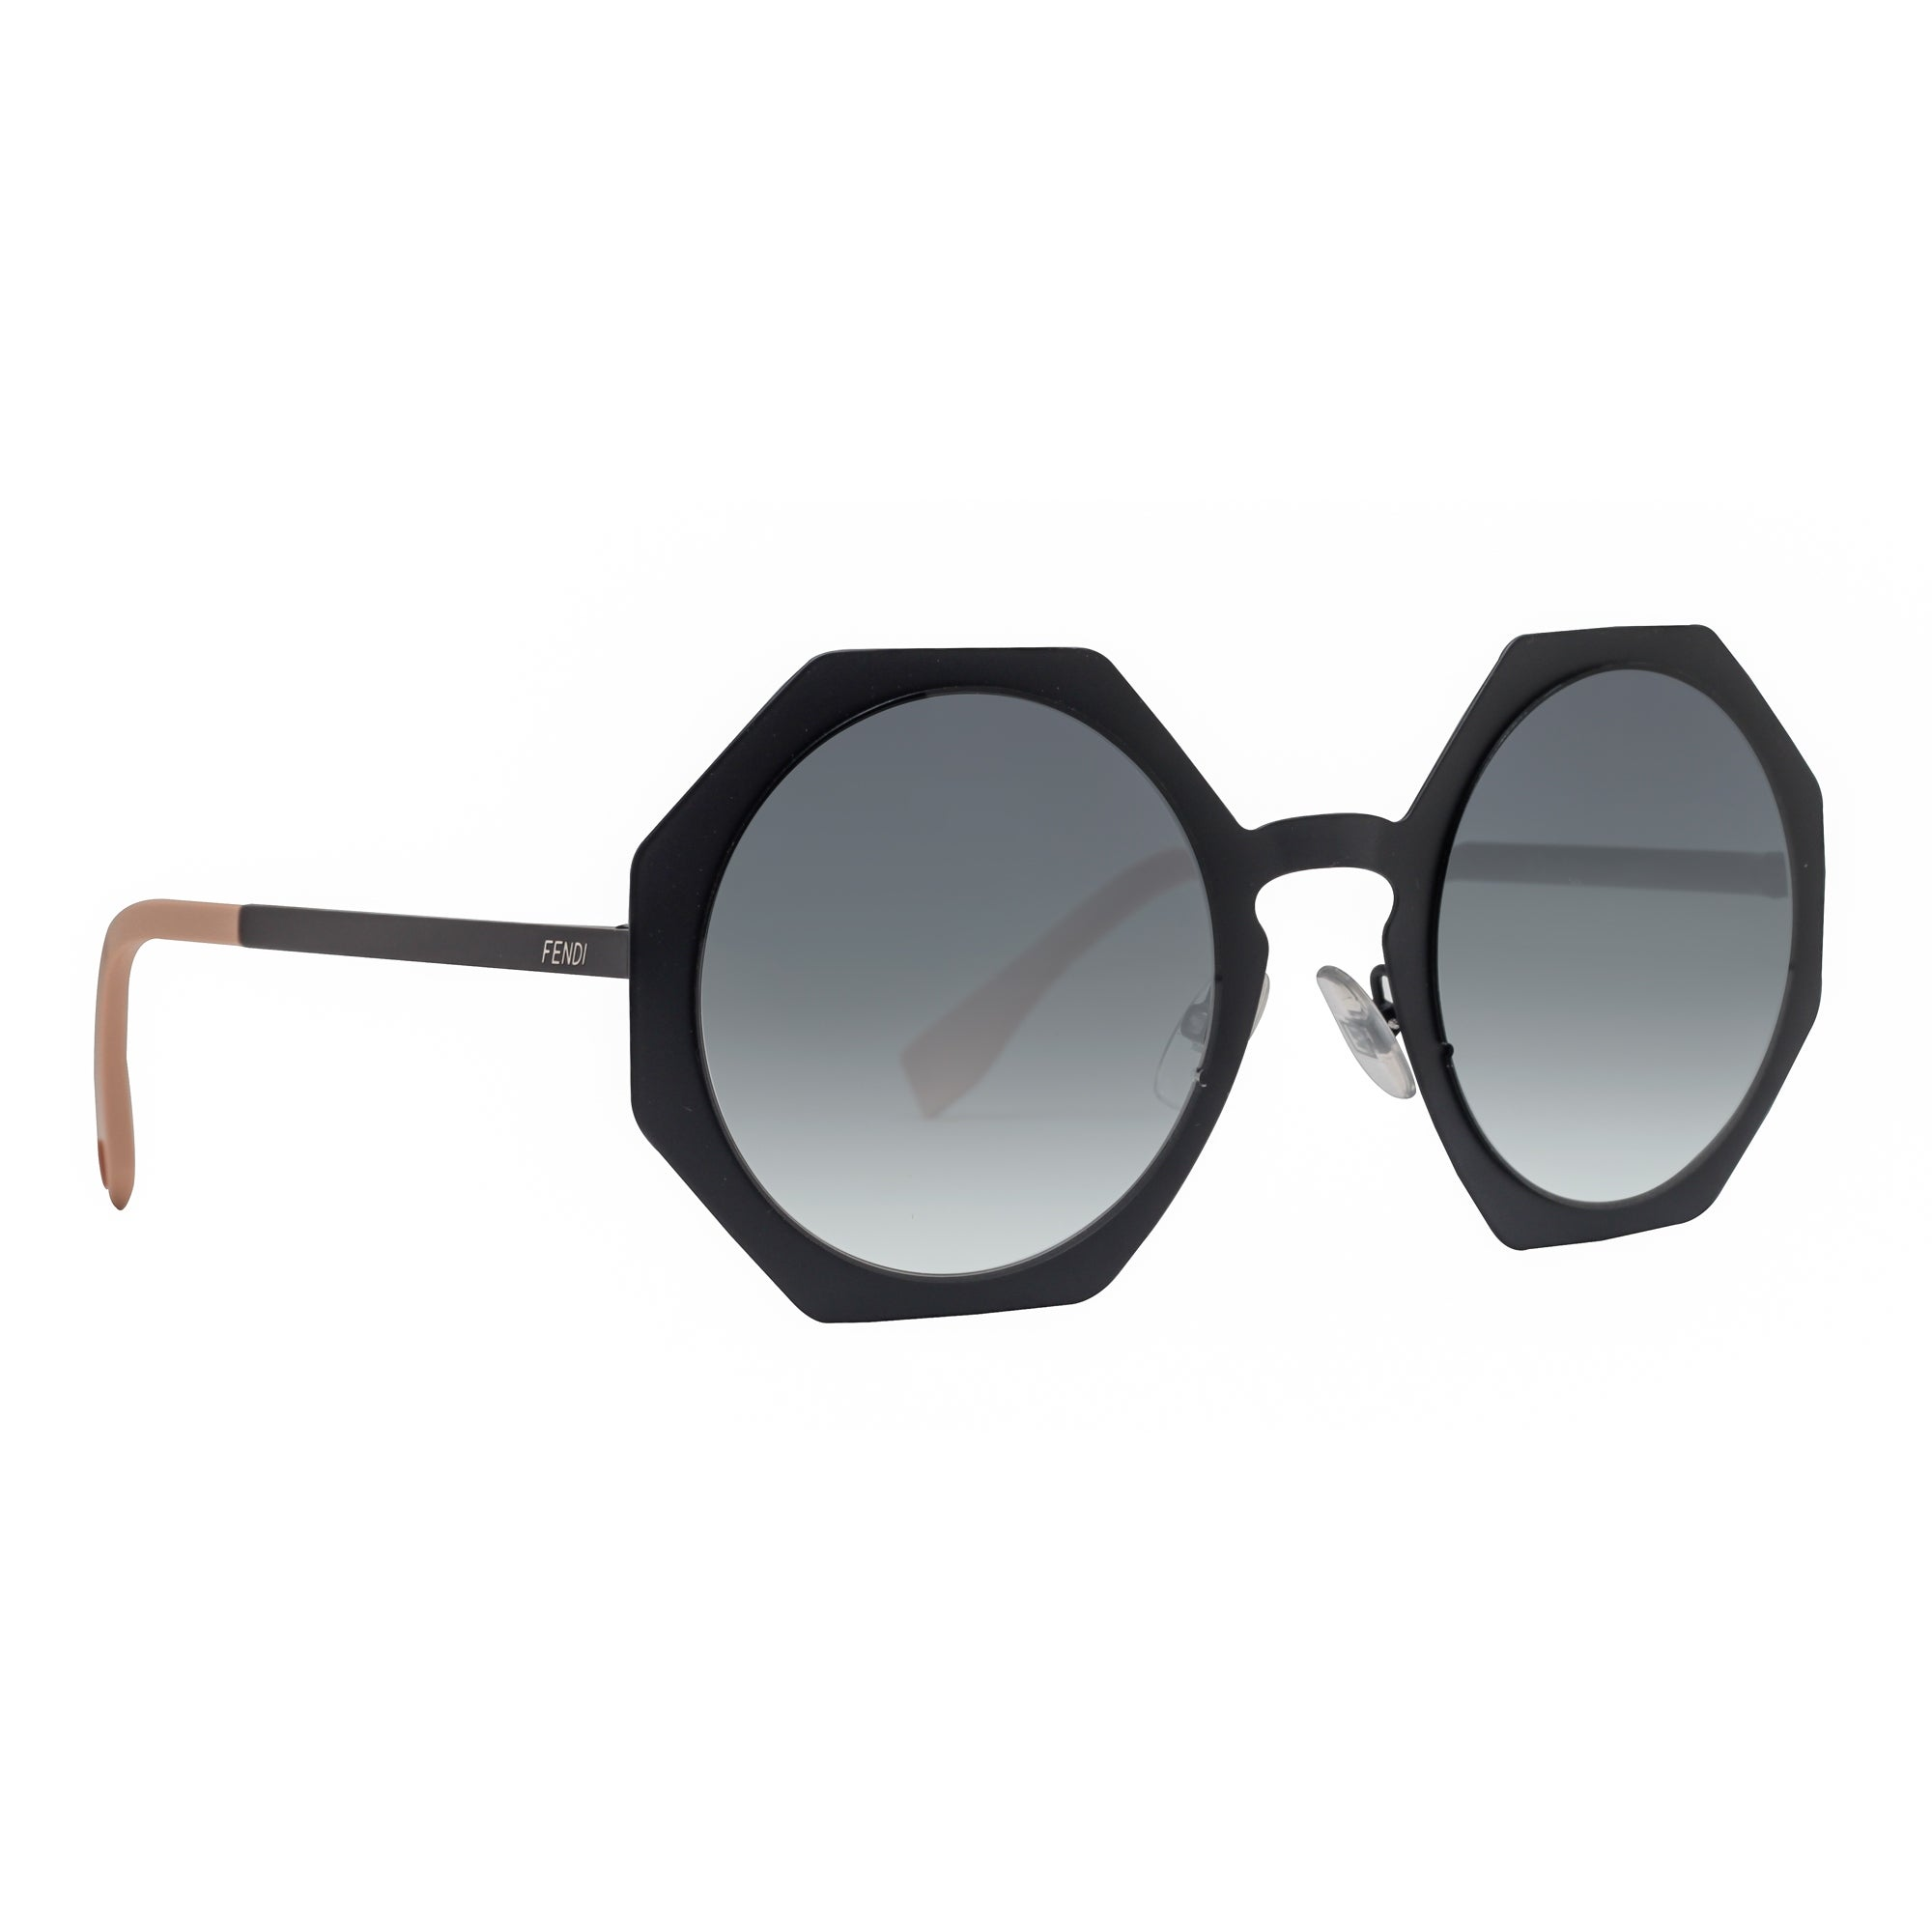 ab29b912af Shop Fendi FF 0152 S 003 JJ Facets Matte Black Grey Gradient Geometric  Sunglasses - MATTE BLACK - 51mm-24mm-145mm - Free Shipping Today -  Overstock - ...